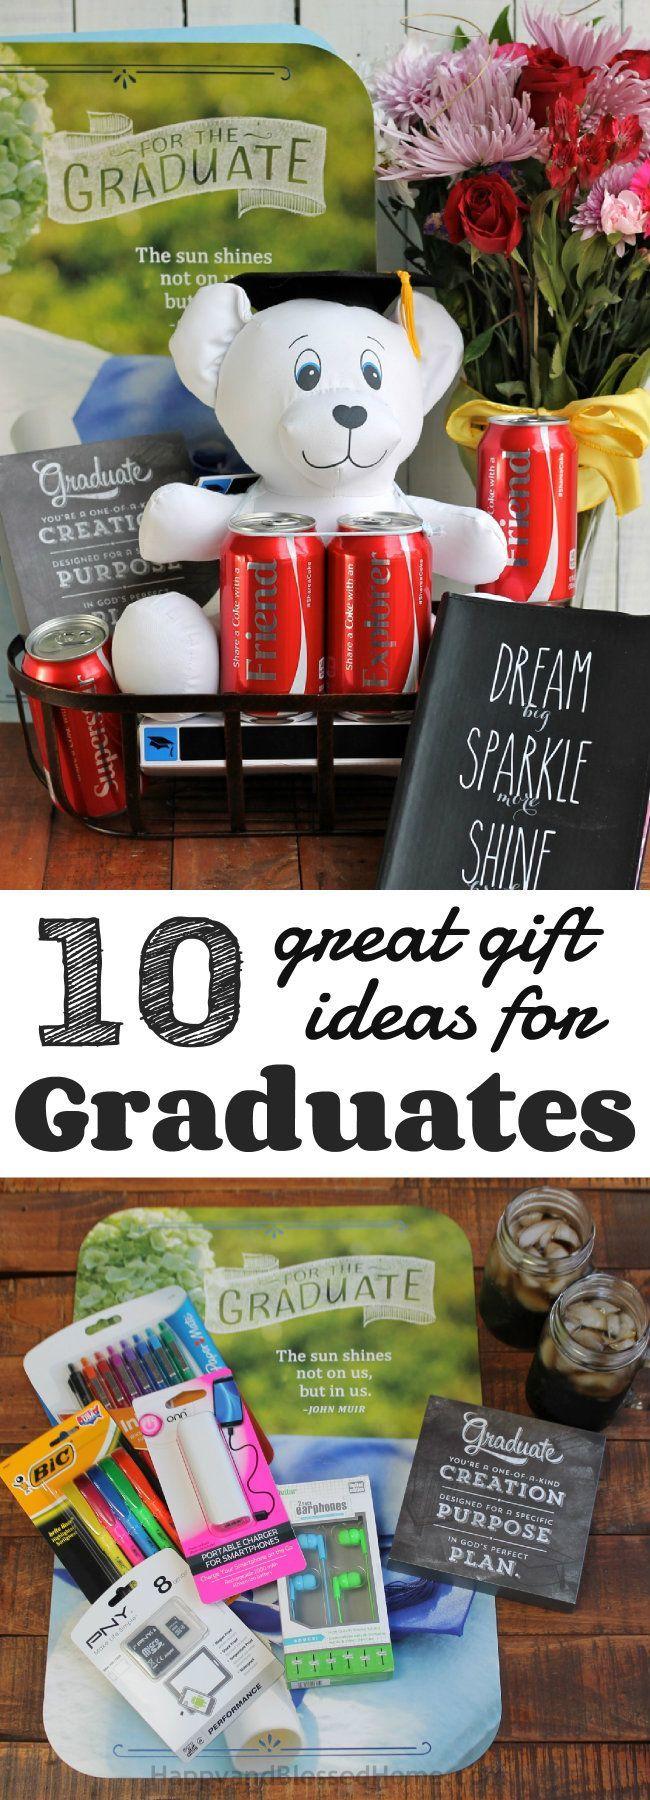 10 Great Gift Ideas For Graduates Graduation Gift Ideas